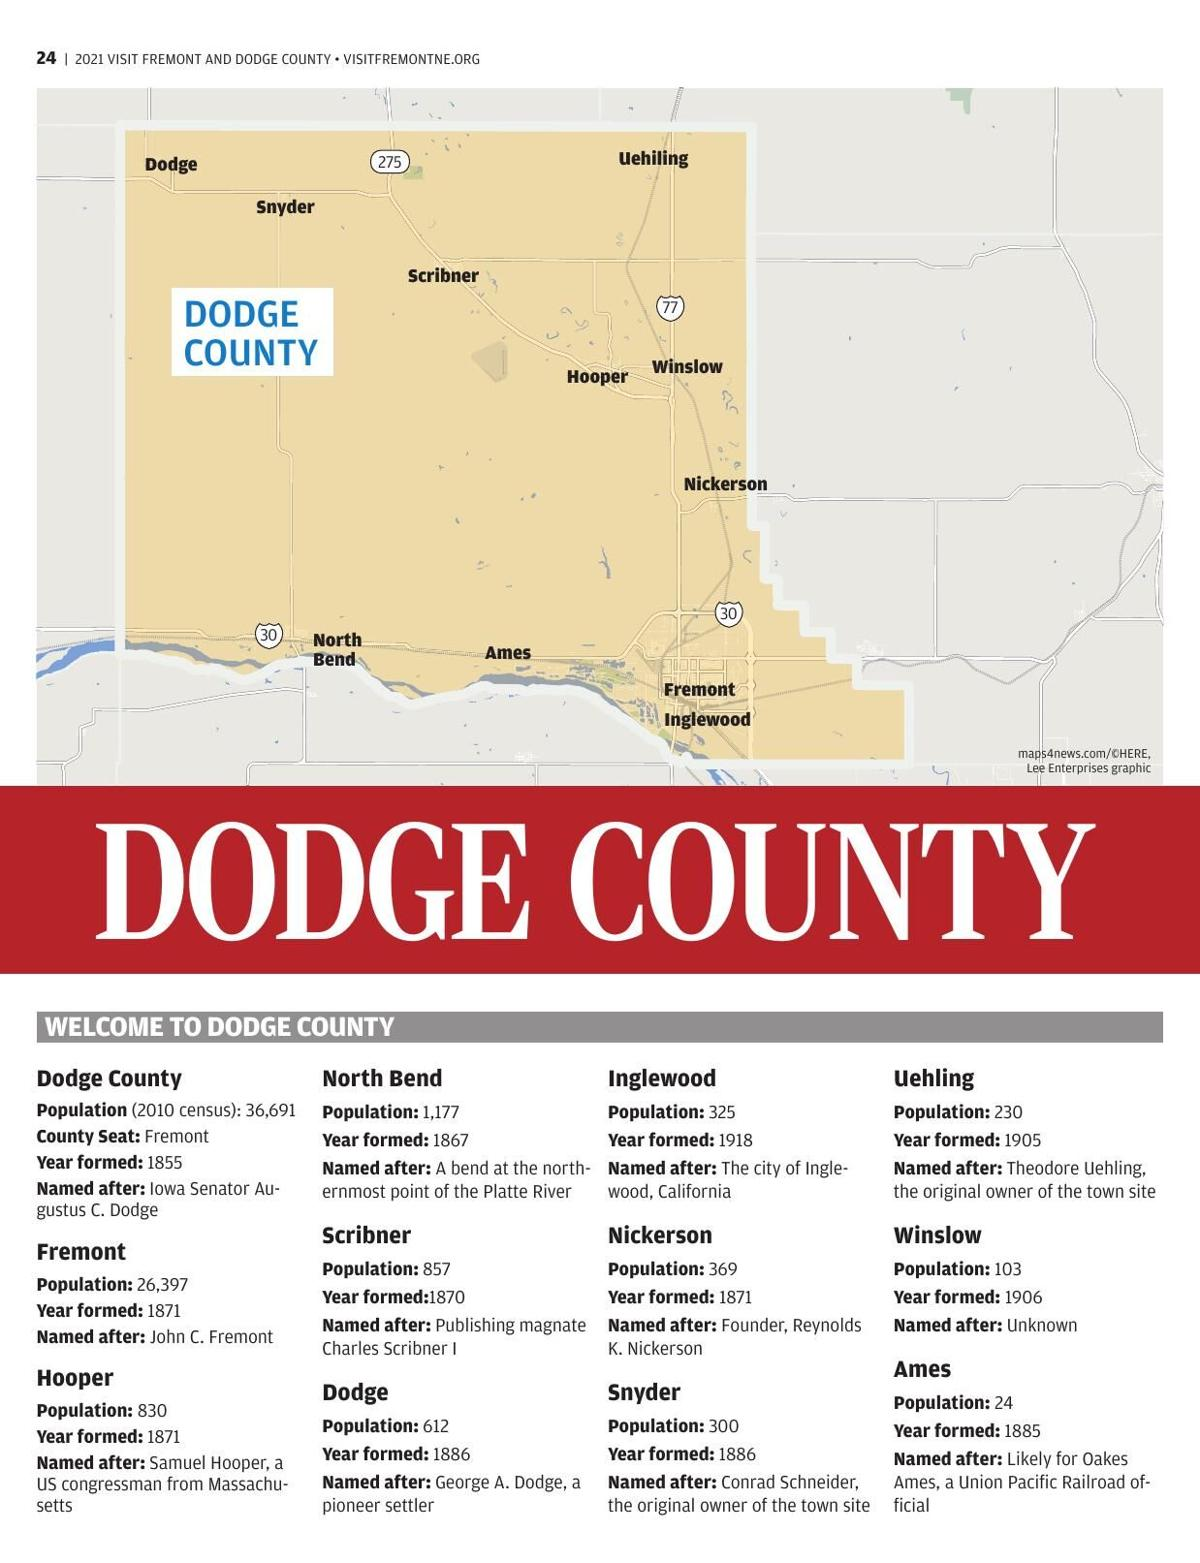 Visit Fremont and Dodge County 2021 24.pdf